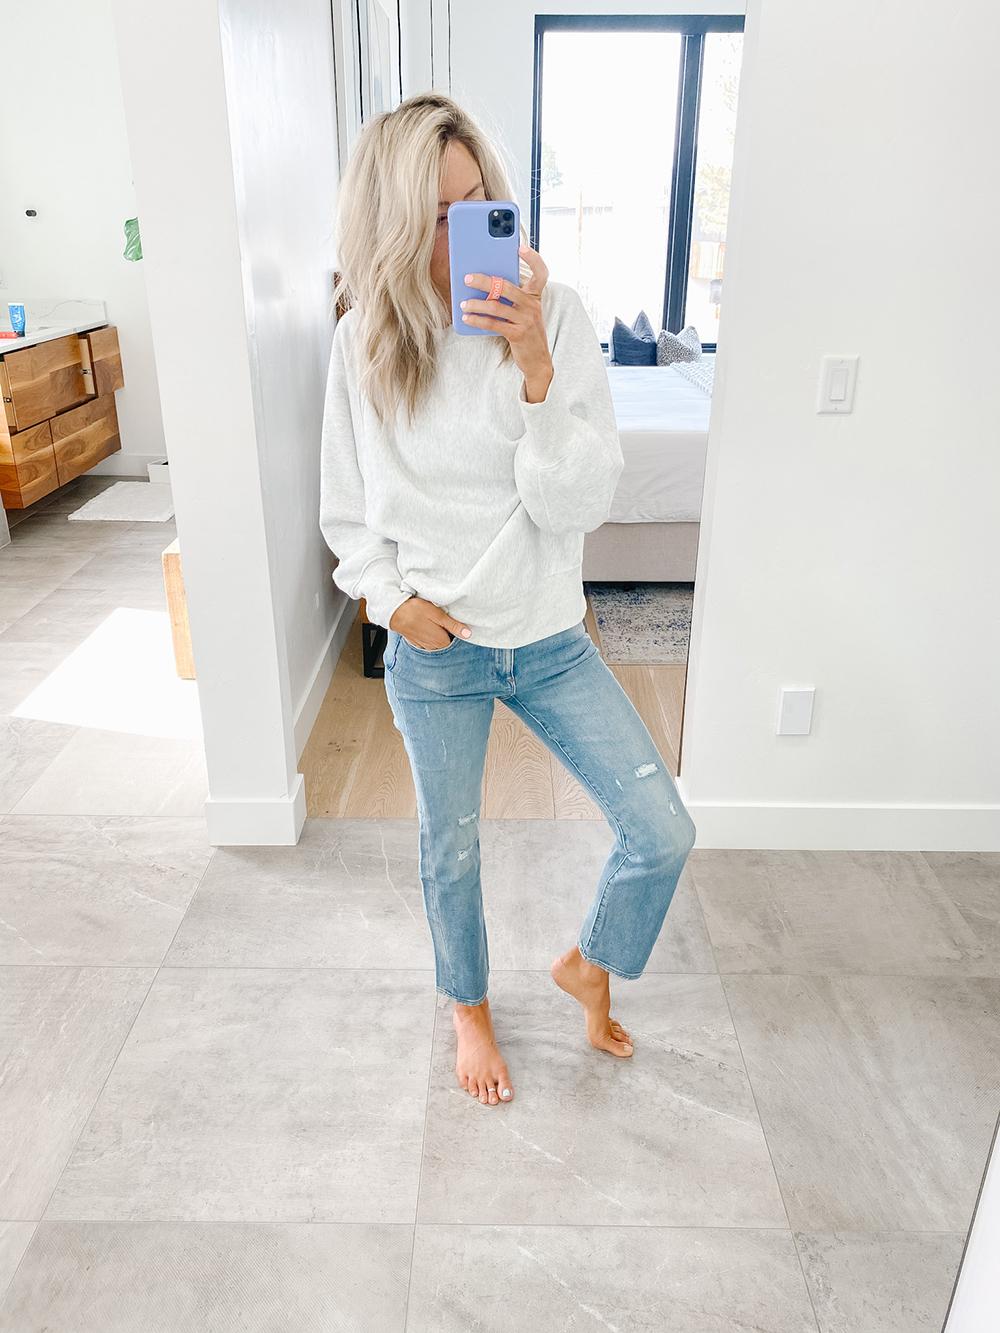 kailee wright Amazon jeans